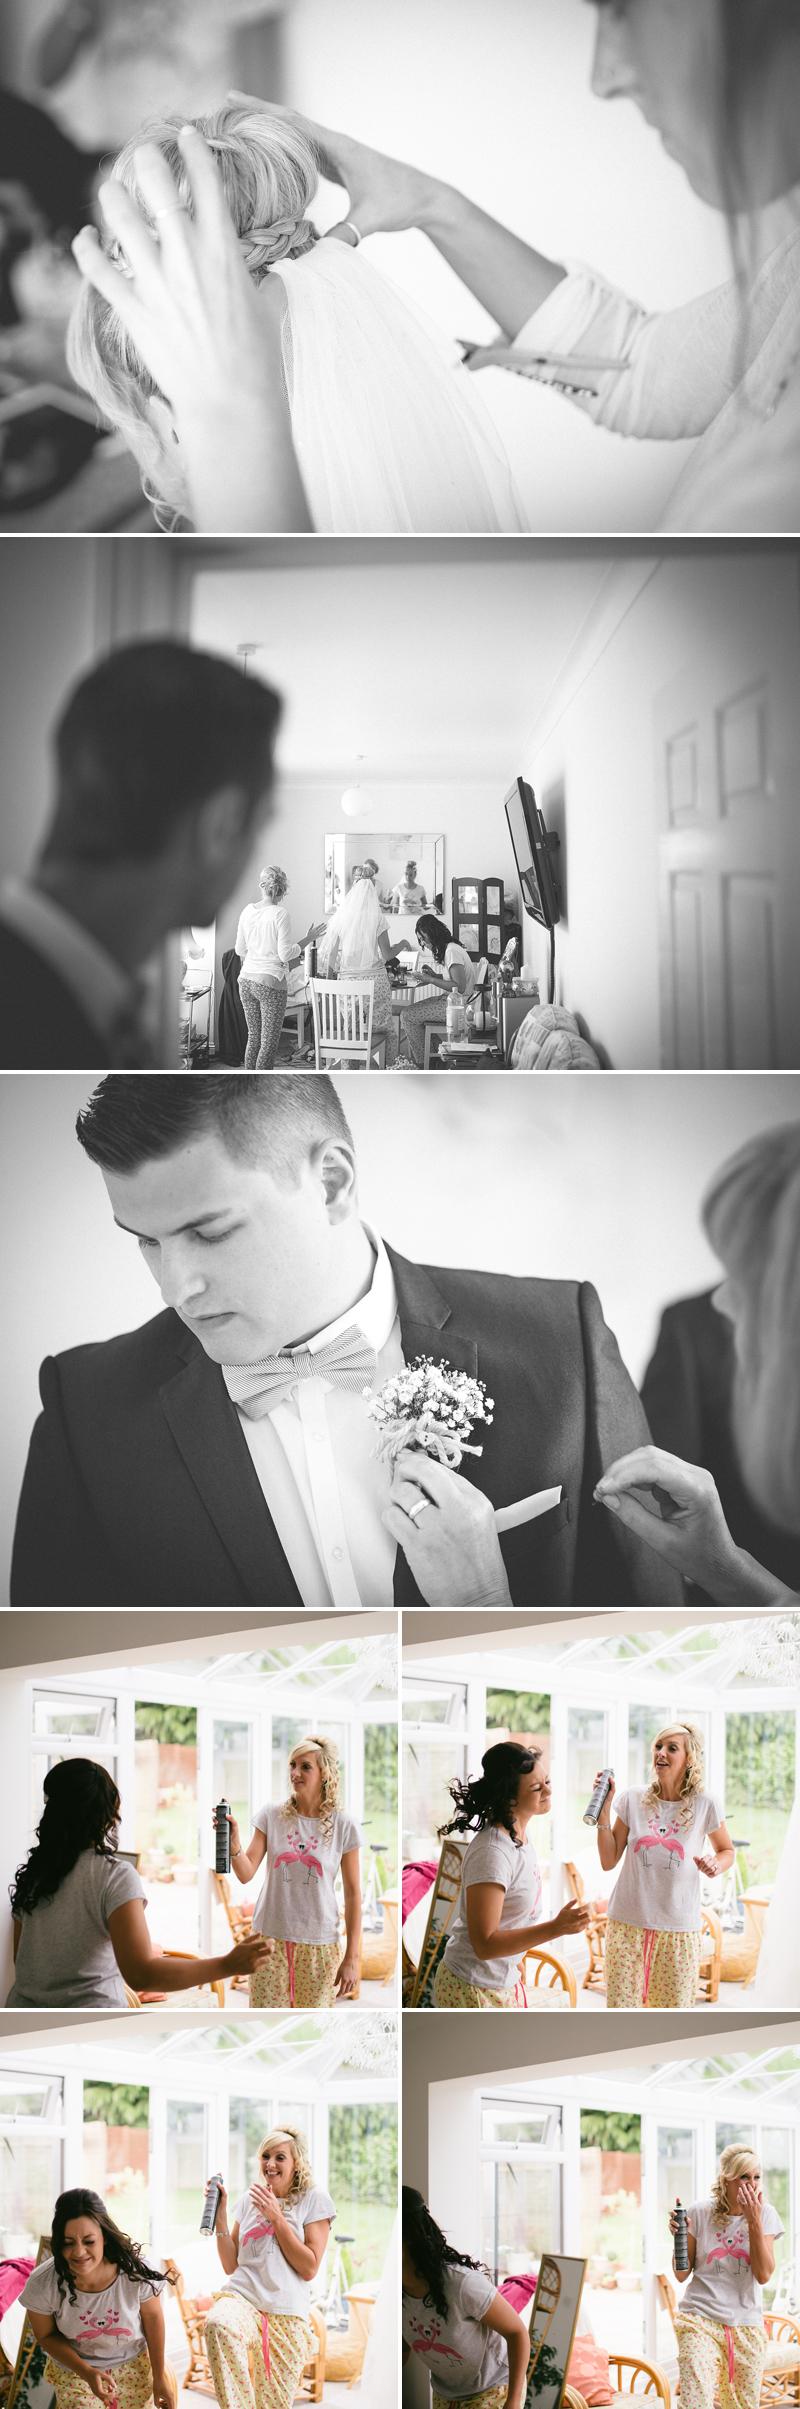 pinning in the wedding veil